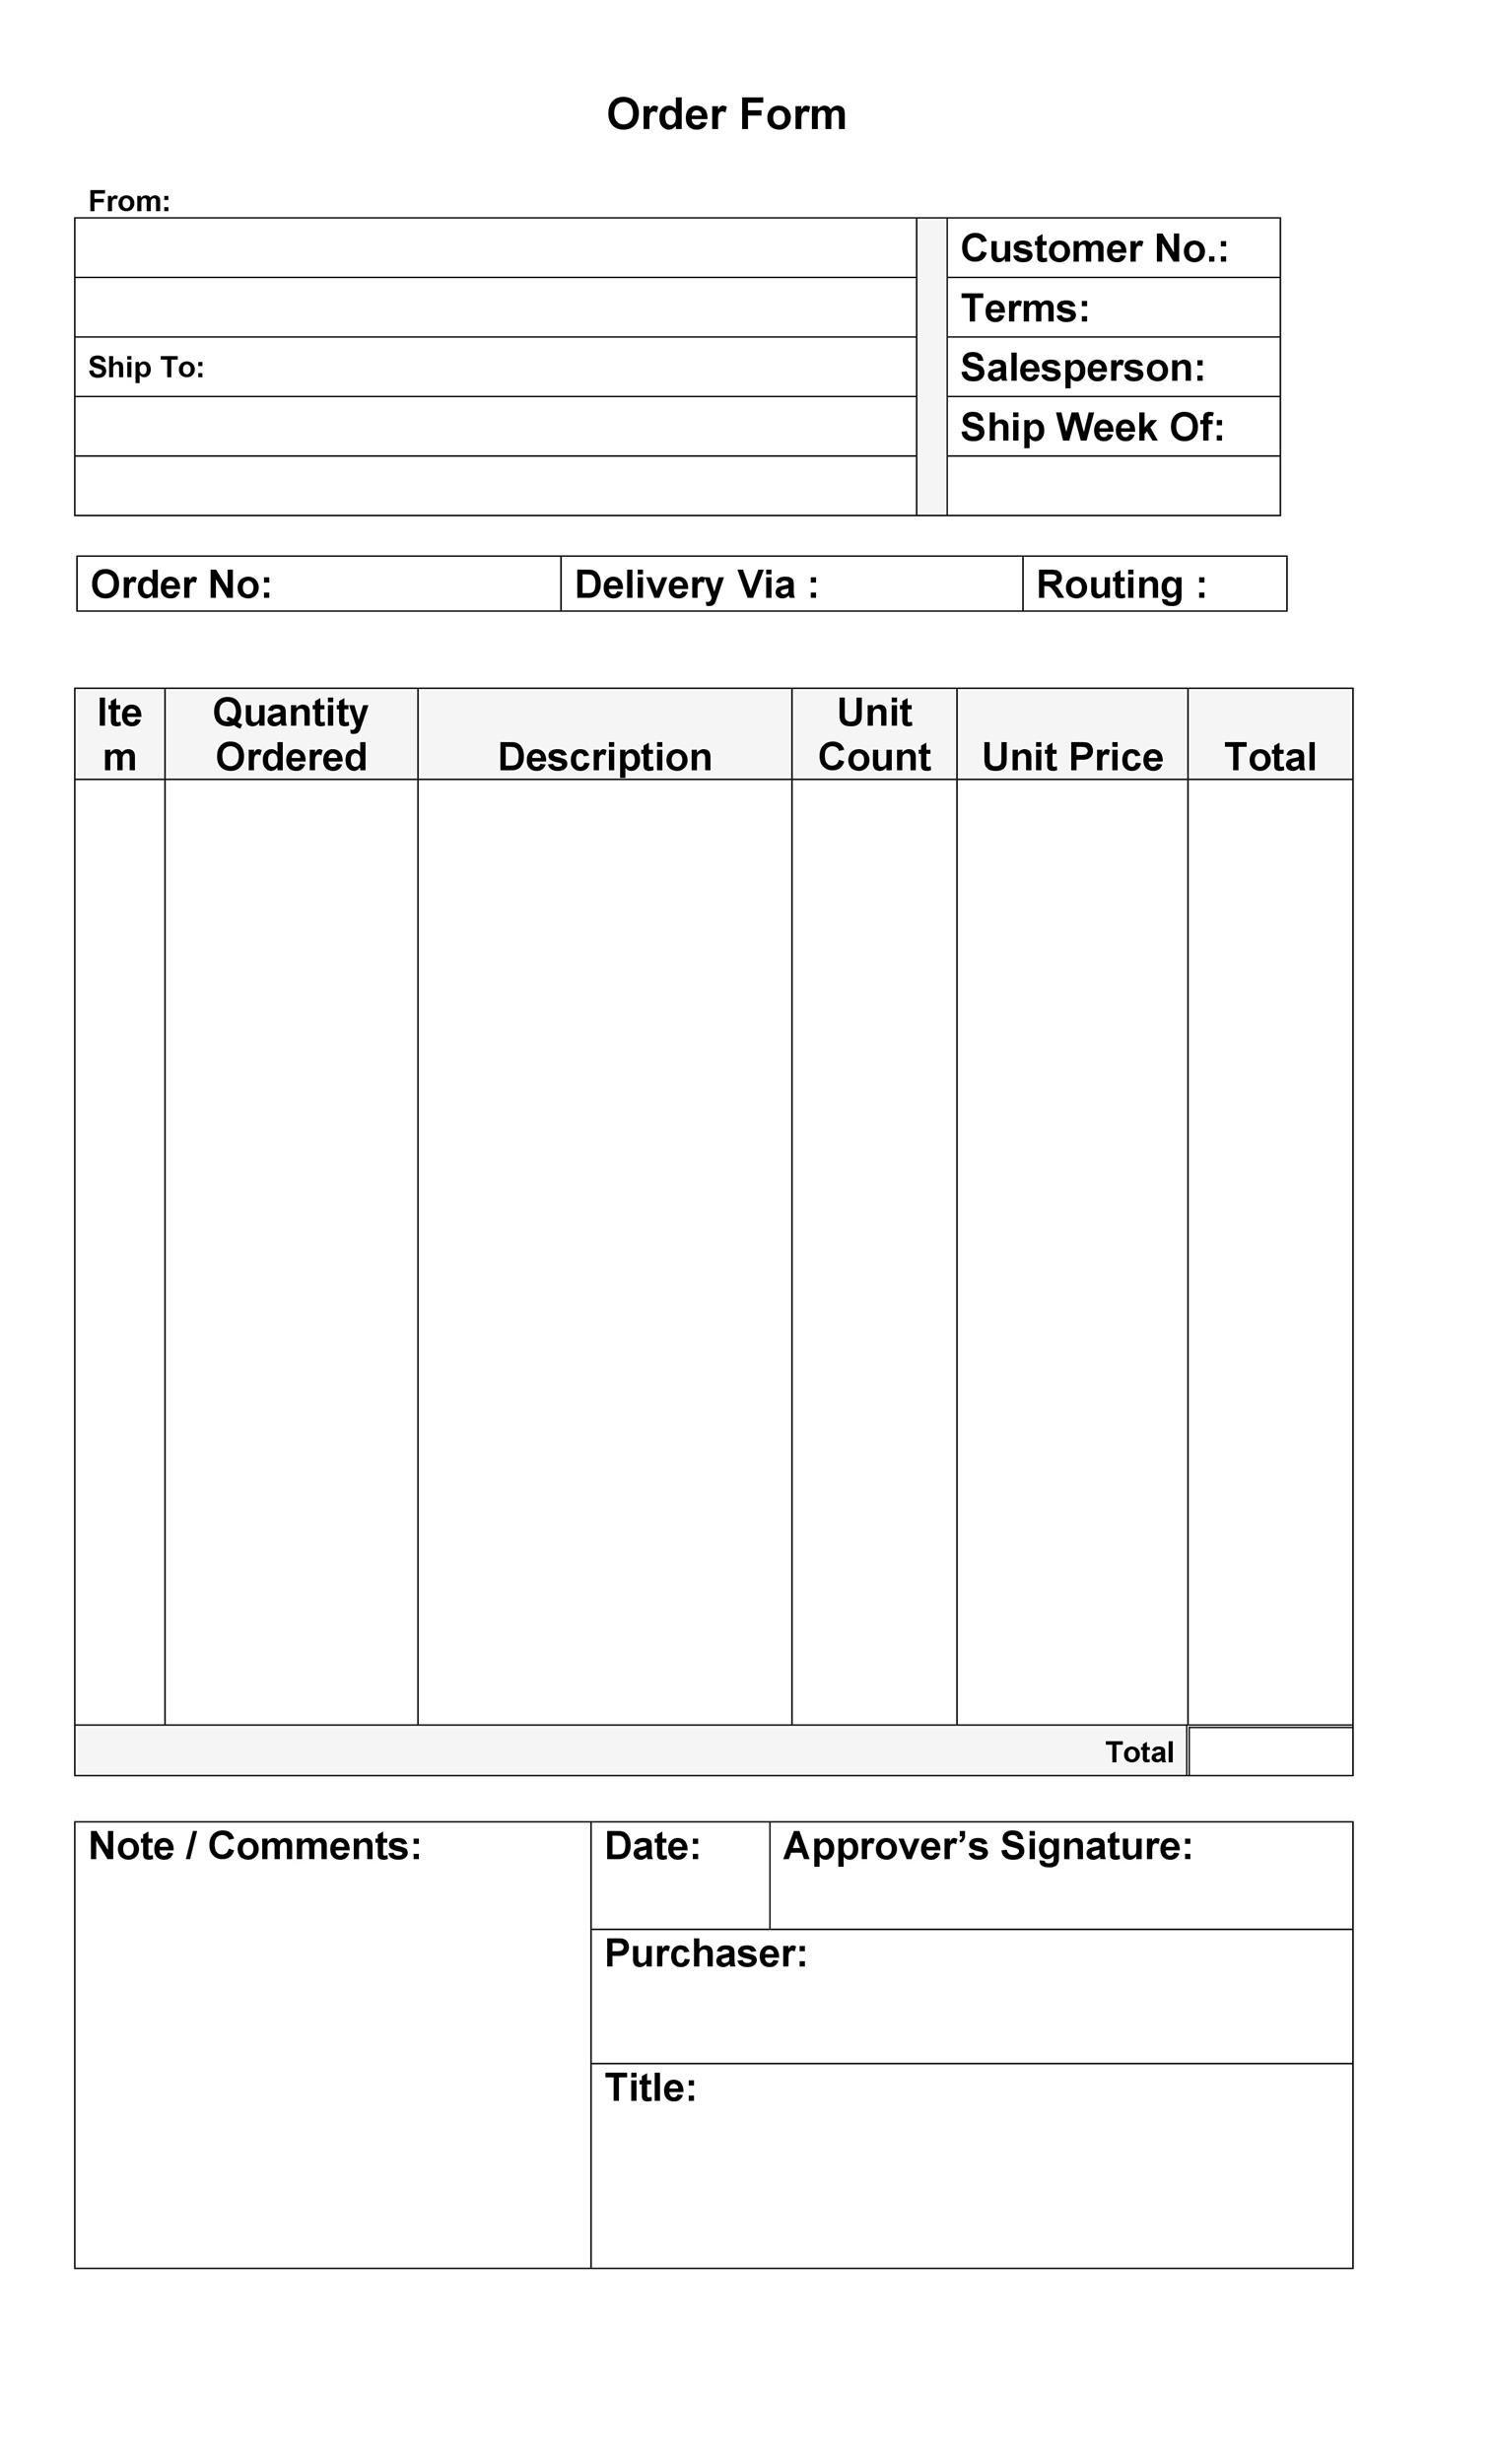 008 Simple Order Form Template Free Design  Application Shirt Word CustomFull